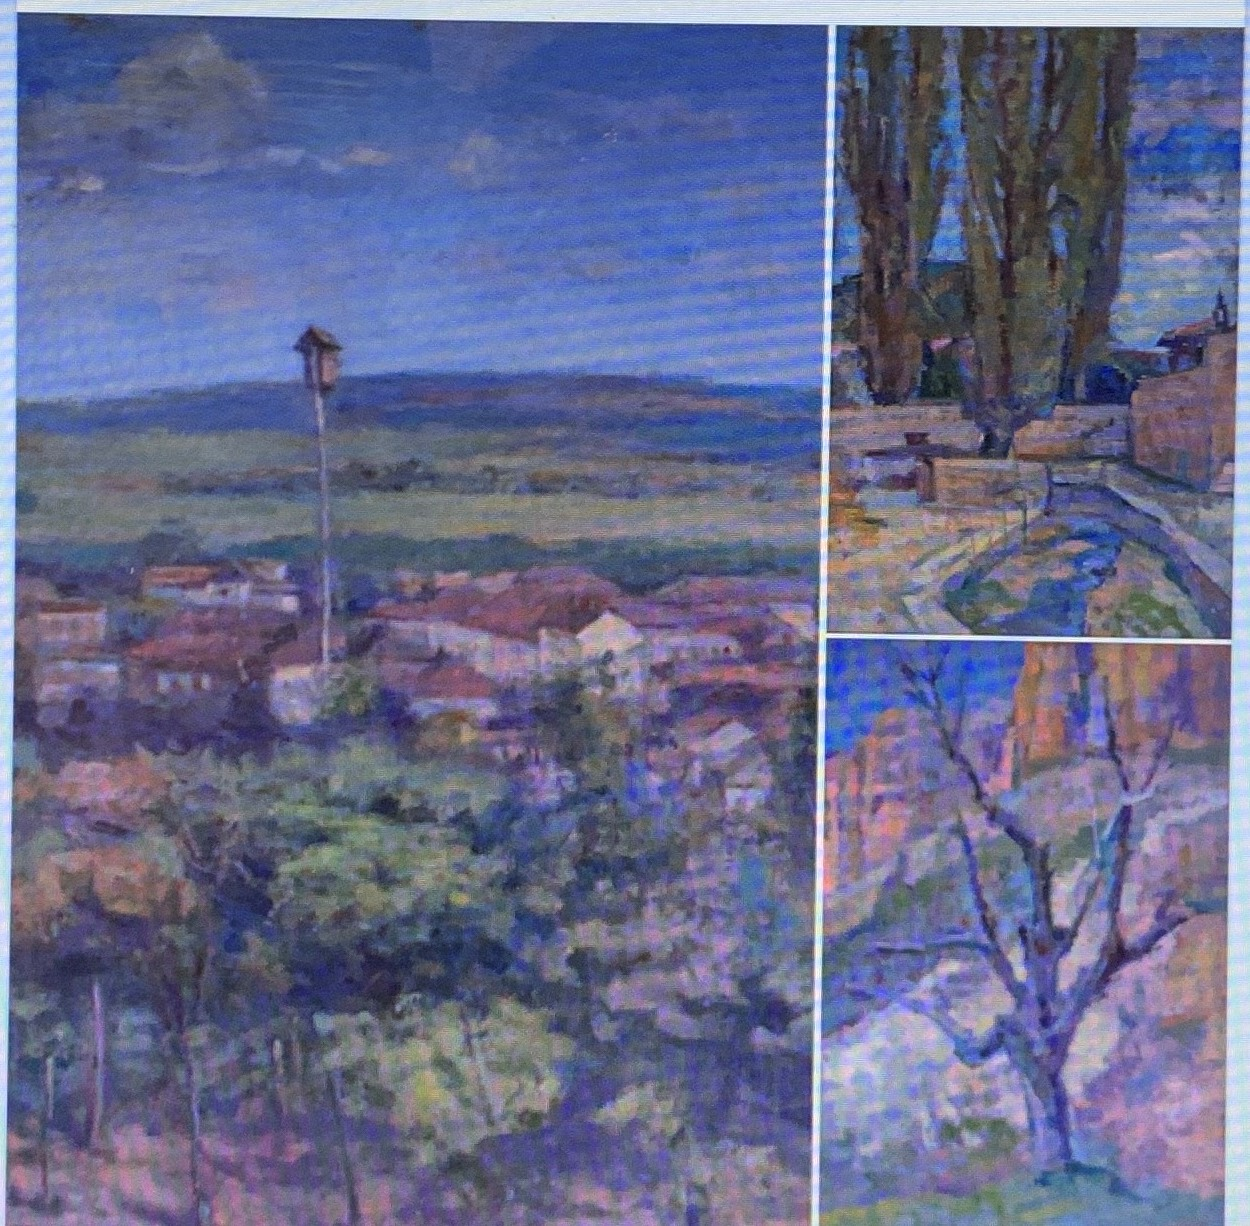 Таруса и Крым. Импрессионистские пейзажи А.М . Глускина на 183 аукционе 27 января 2021